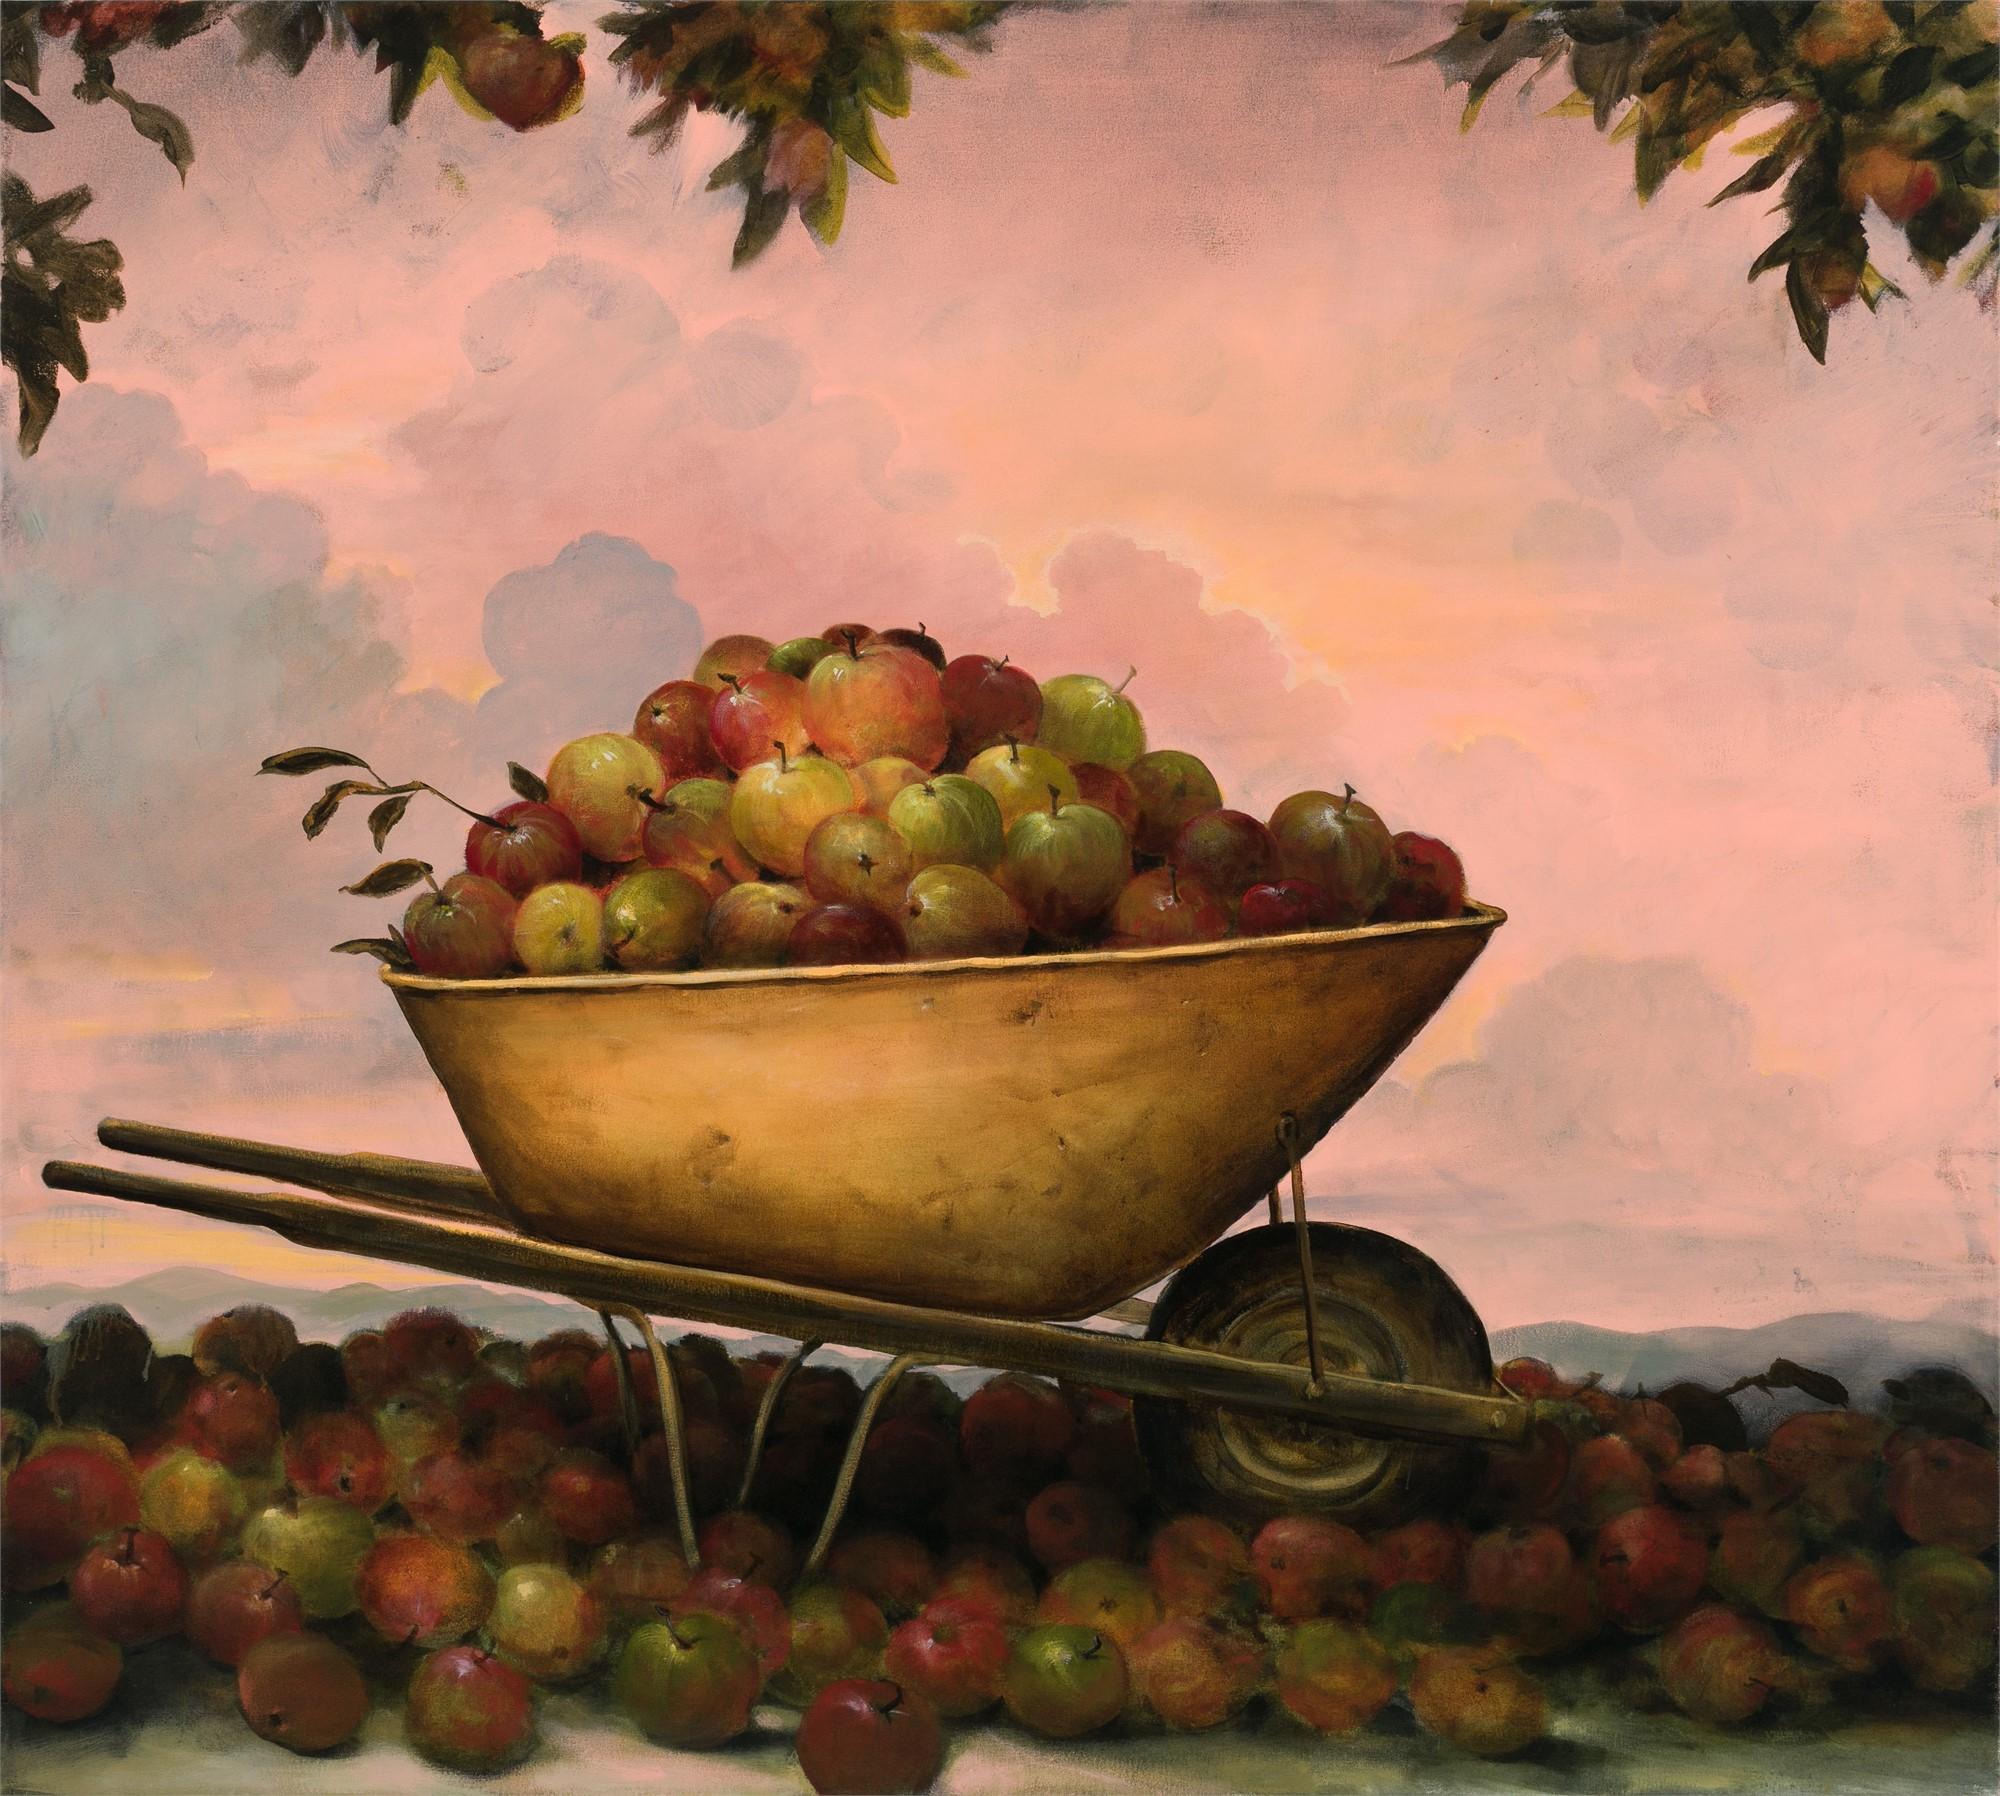 Apples I've Eaten by Kevin Sloan